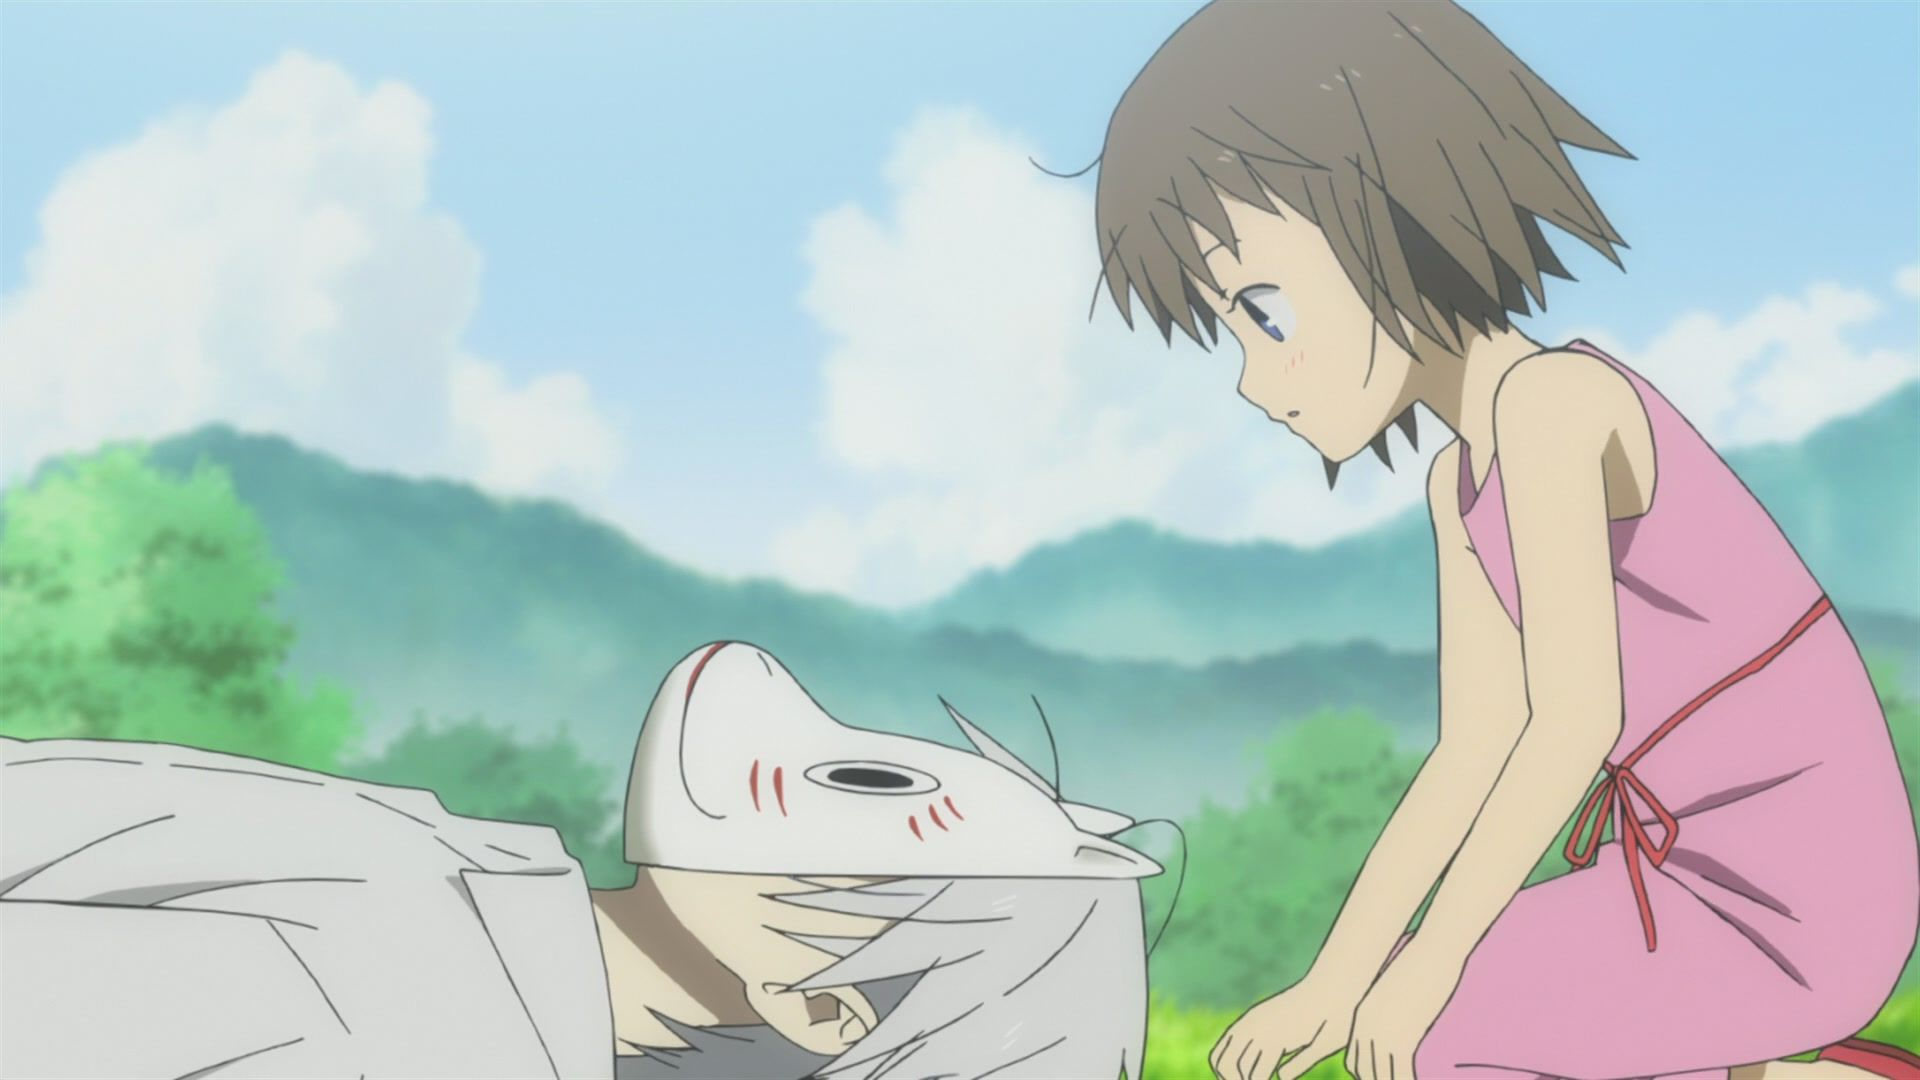 Hotarubi no Mori e สู่ป่าแห่งแสงหิ่งห้อย 蛍火の杜